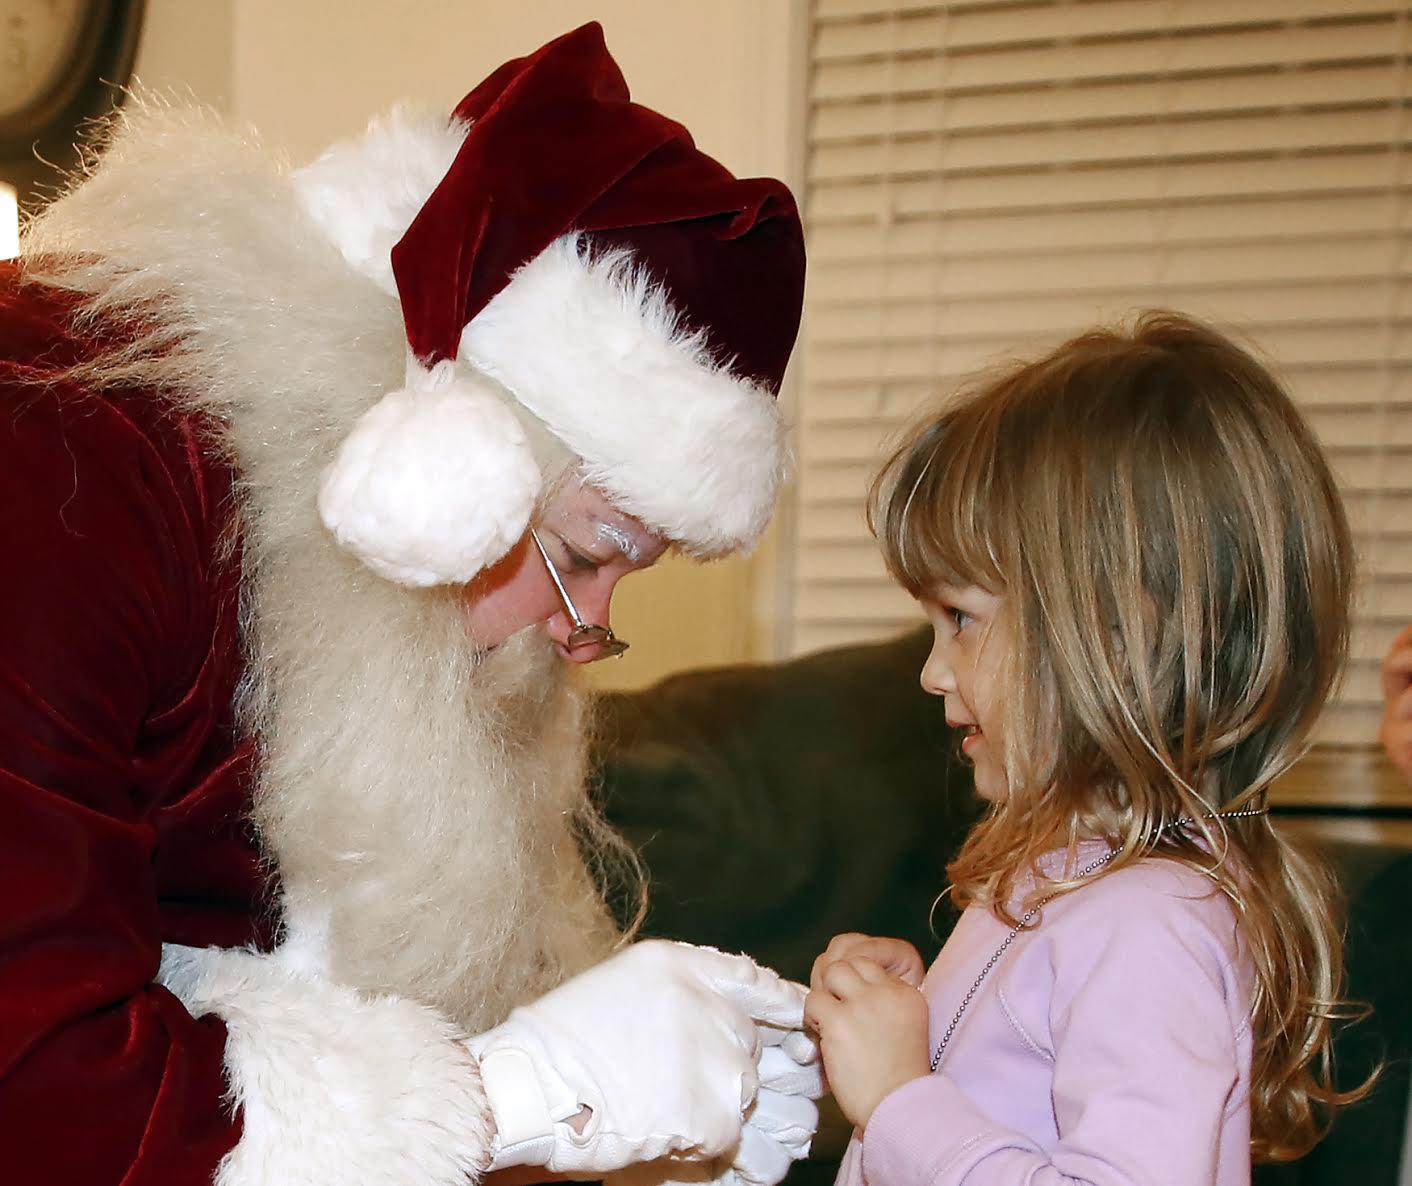 Santa Meets a Fan